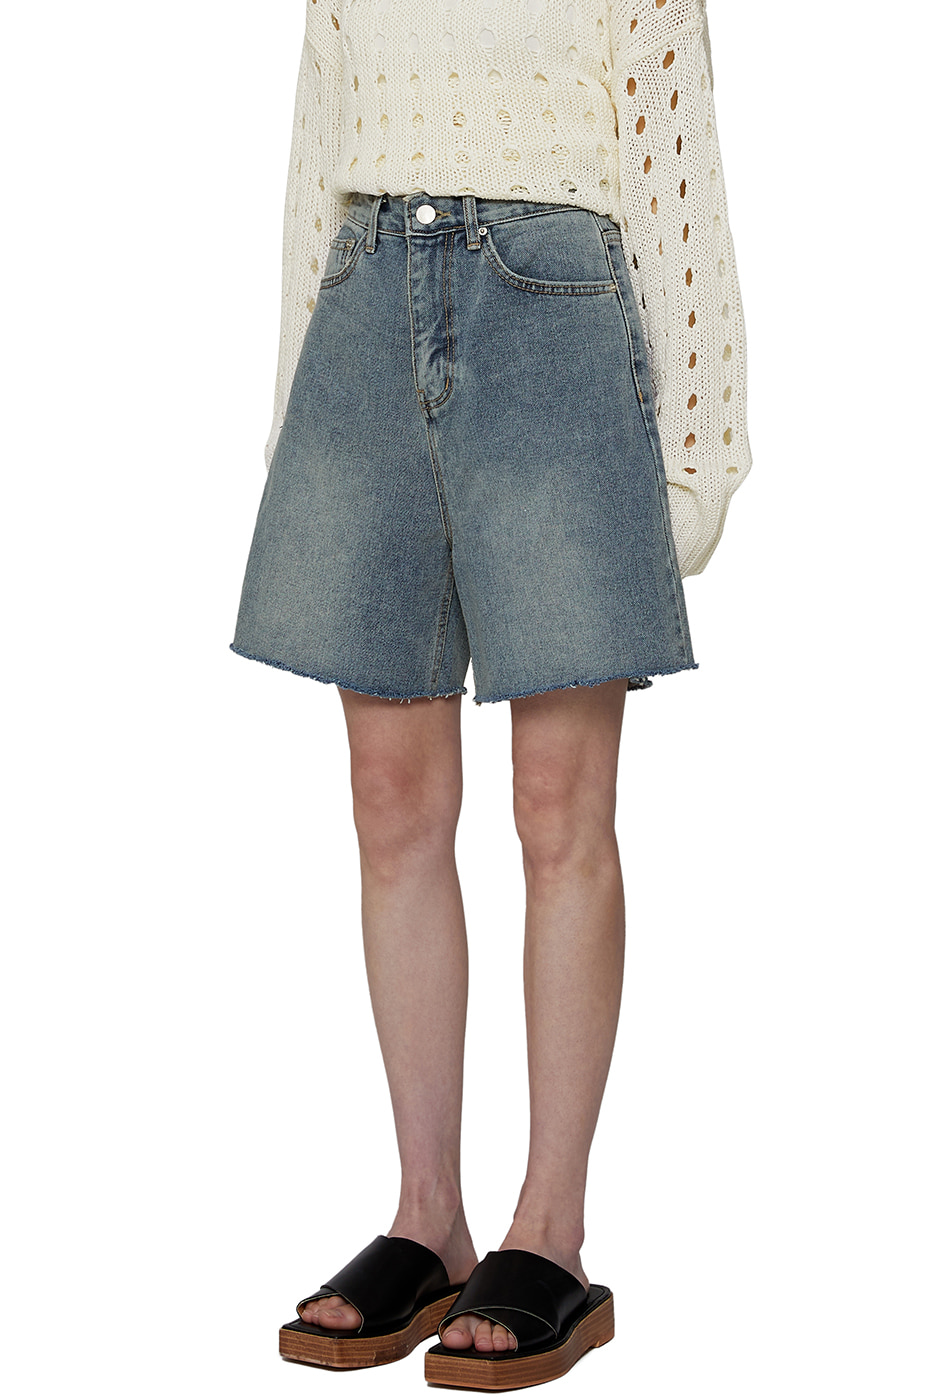 Work denim shorts